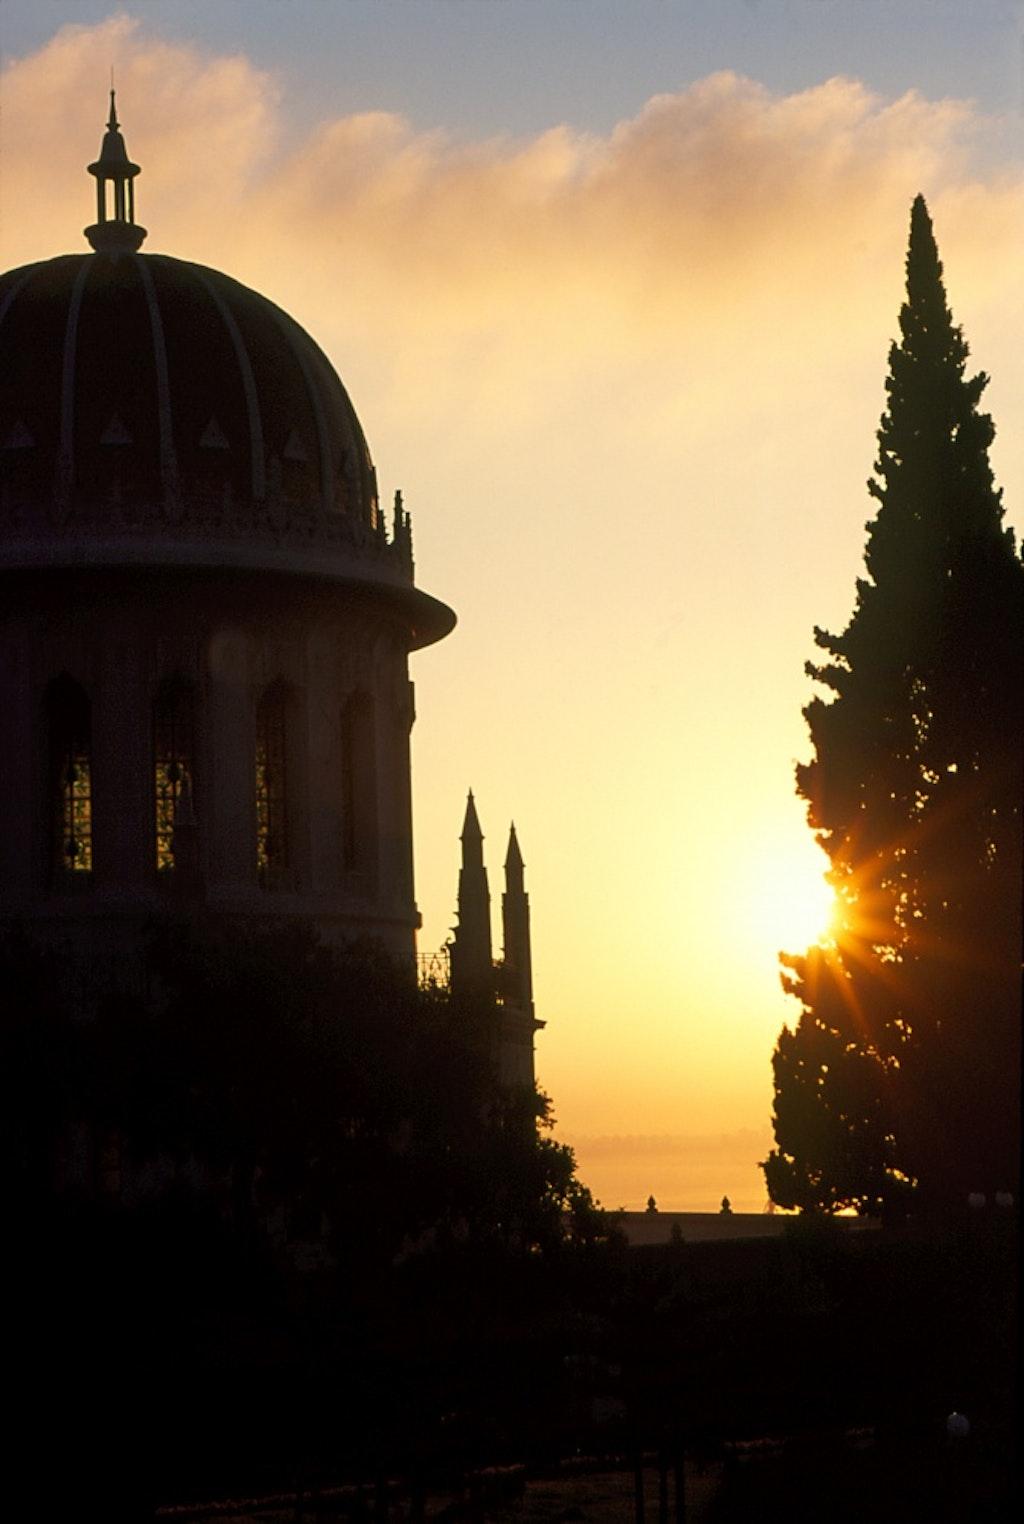 Bahá'ís celebrate the anniversary of the Declaration of the Báb